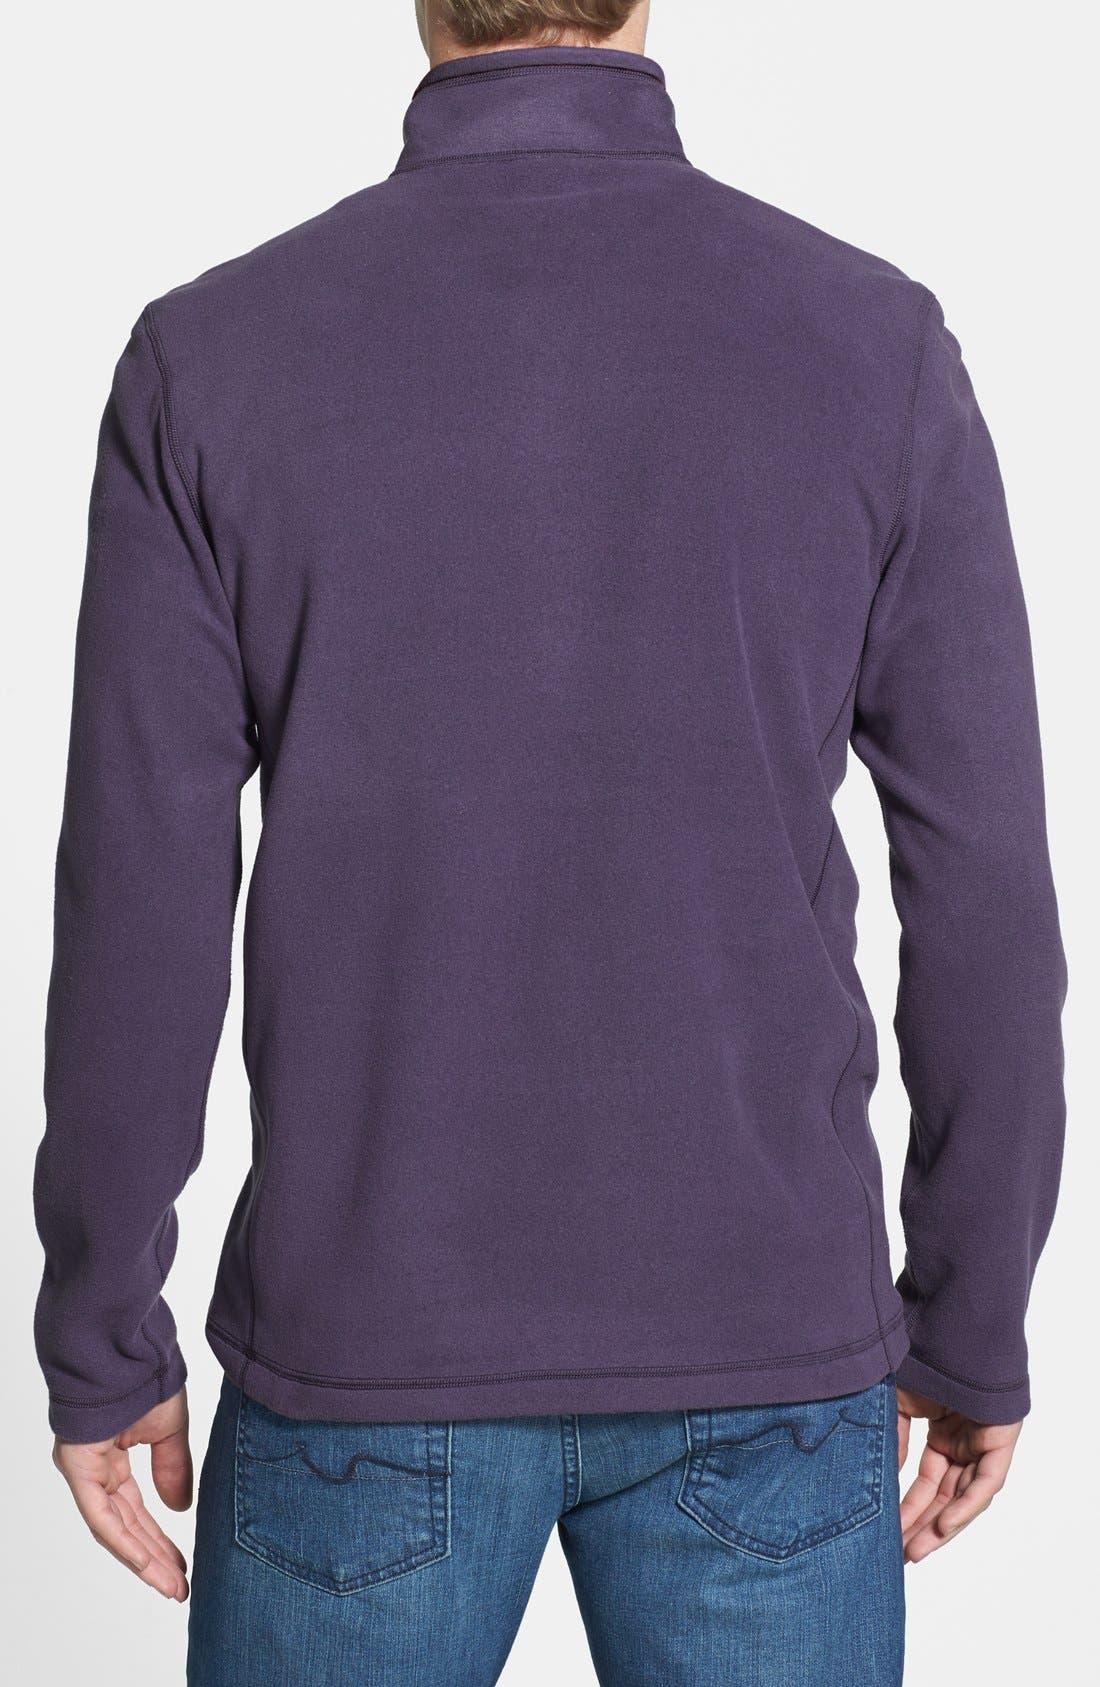 'TKA 100 Glacier' Quarter Zip Fleece Pullover,                             Alternate thumbnail 129, color,